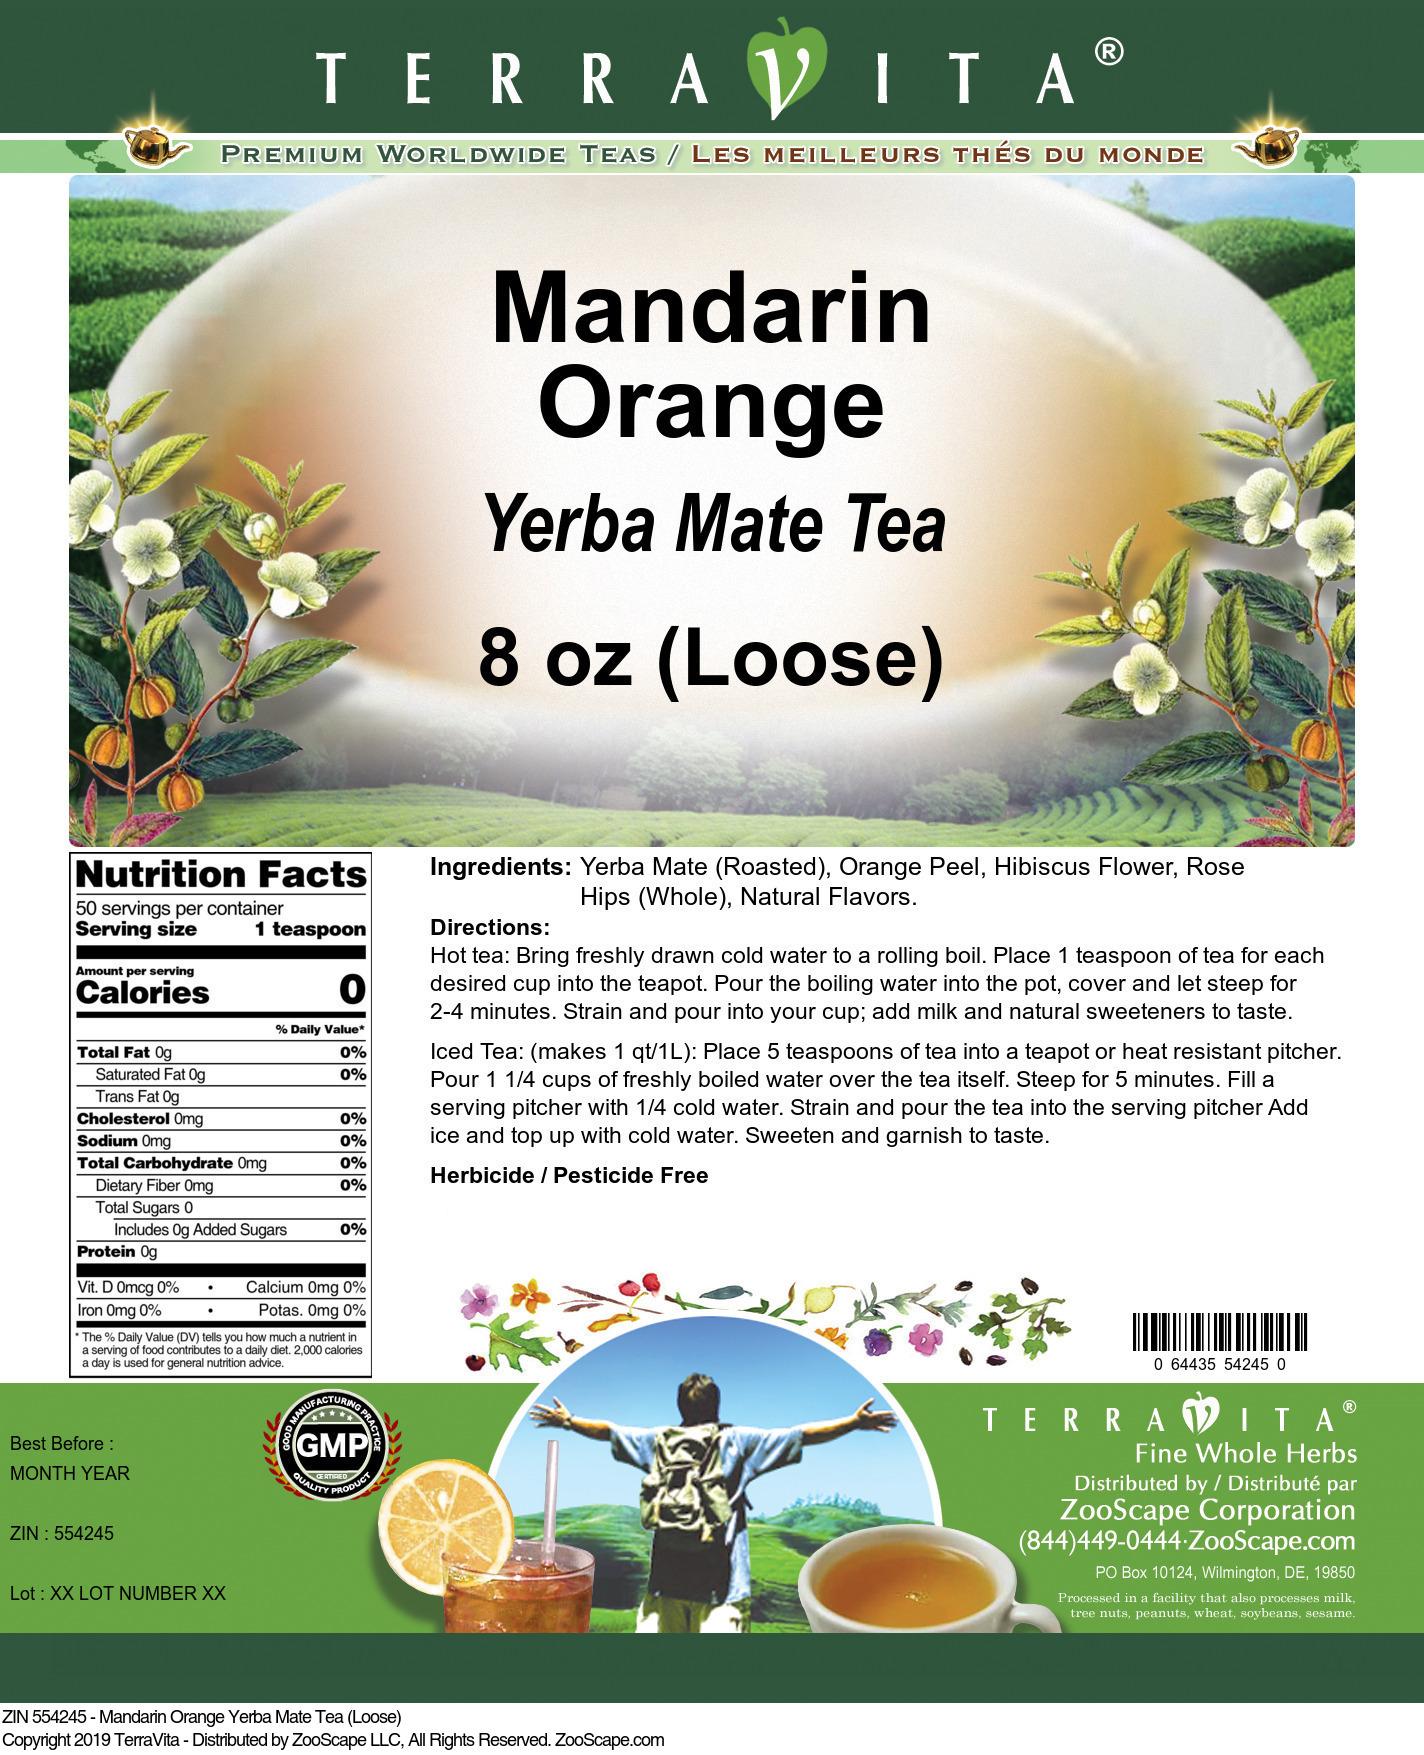 Mandarin Orange Yerba Mate